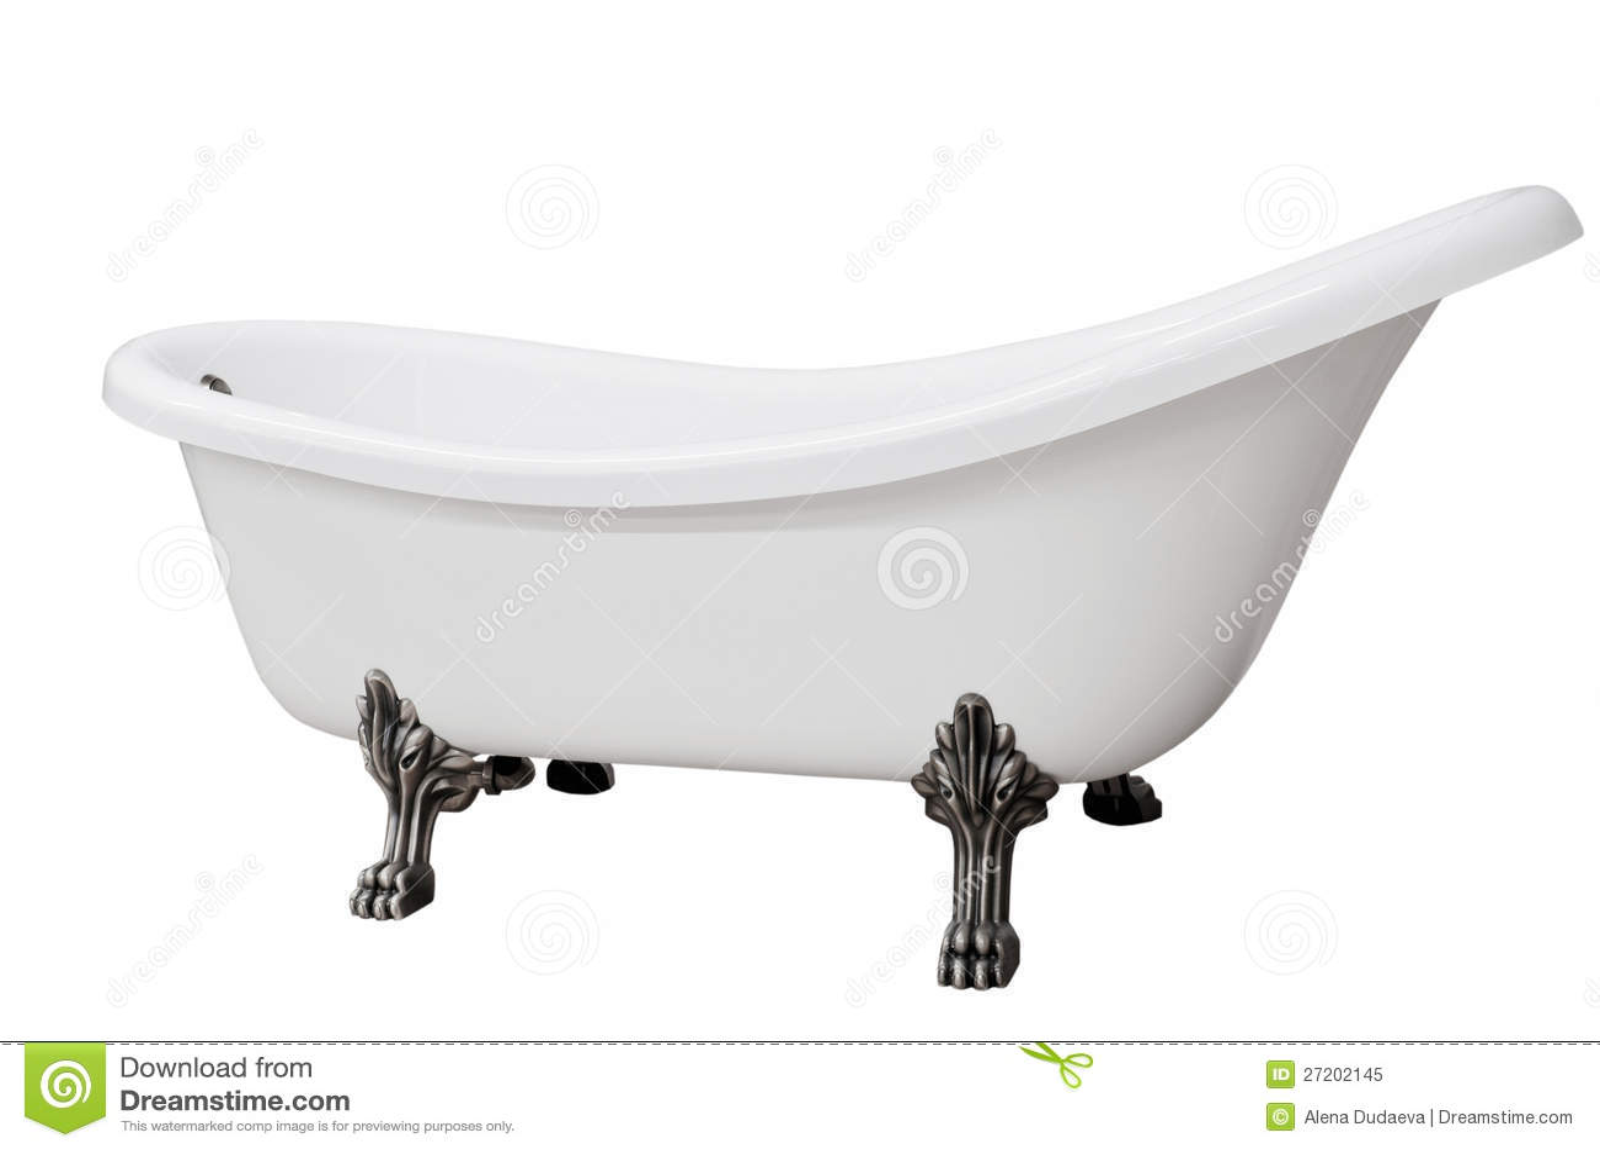 Classic White Bathtub With Legs Royalty Free Stock Photo